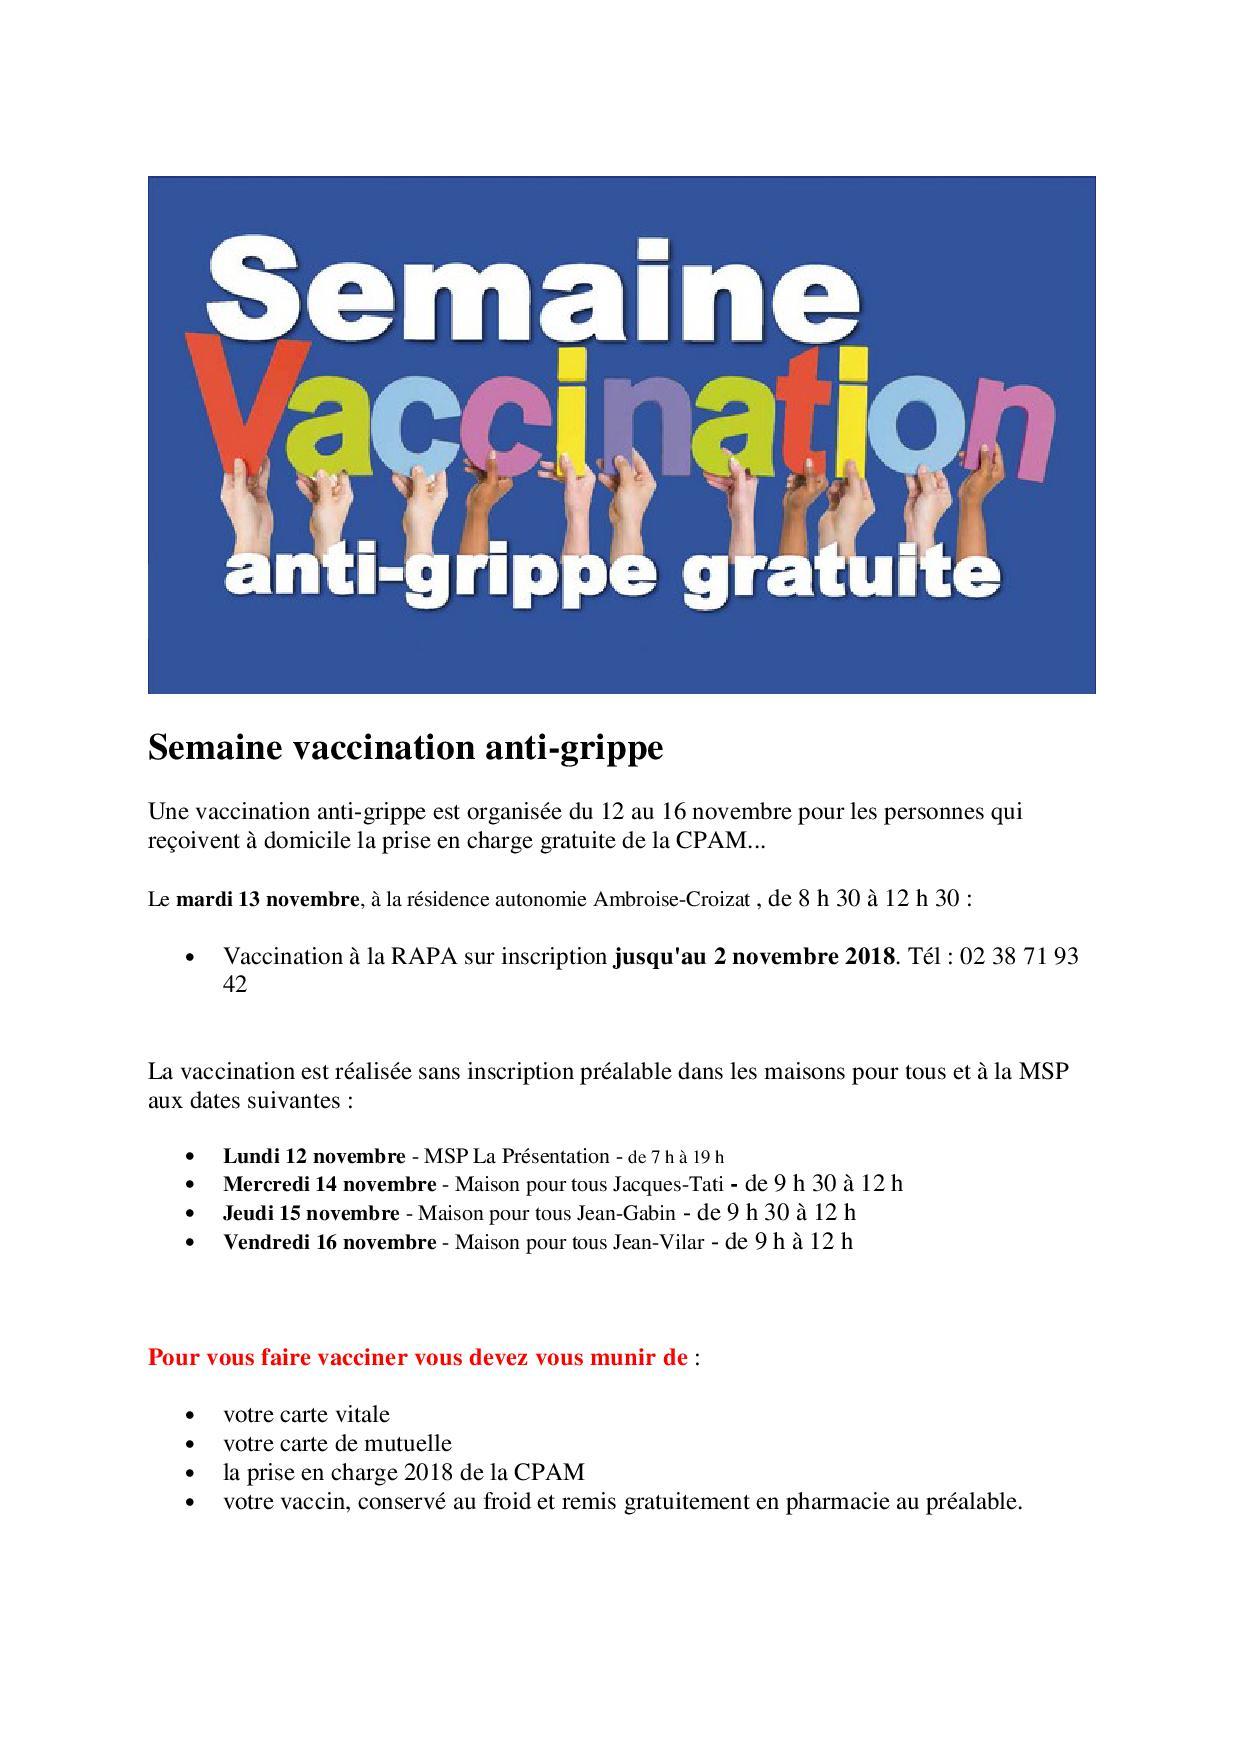 Affiche  Semaine Vaccination anti-grippe 2018.jpg